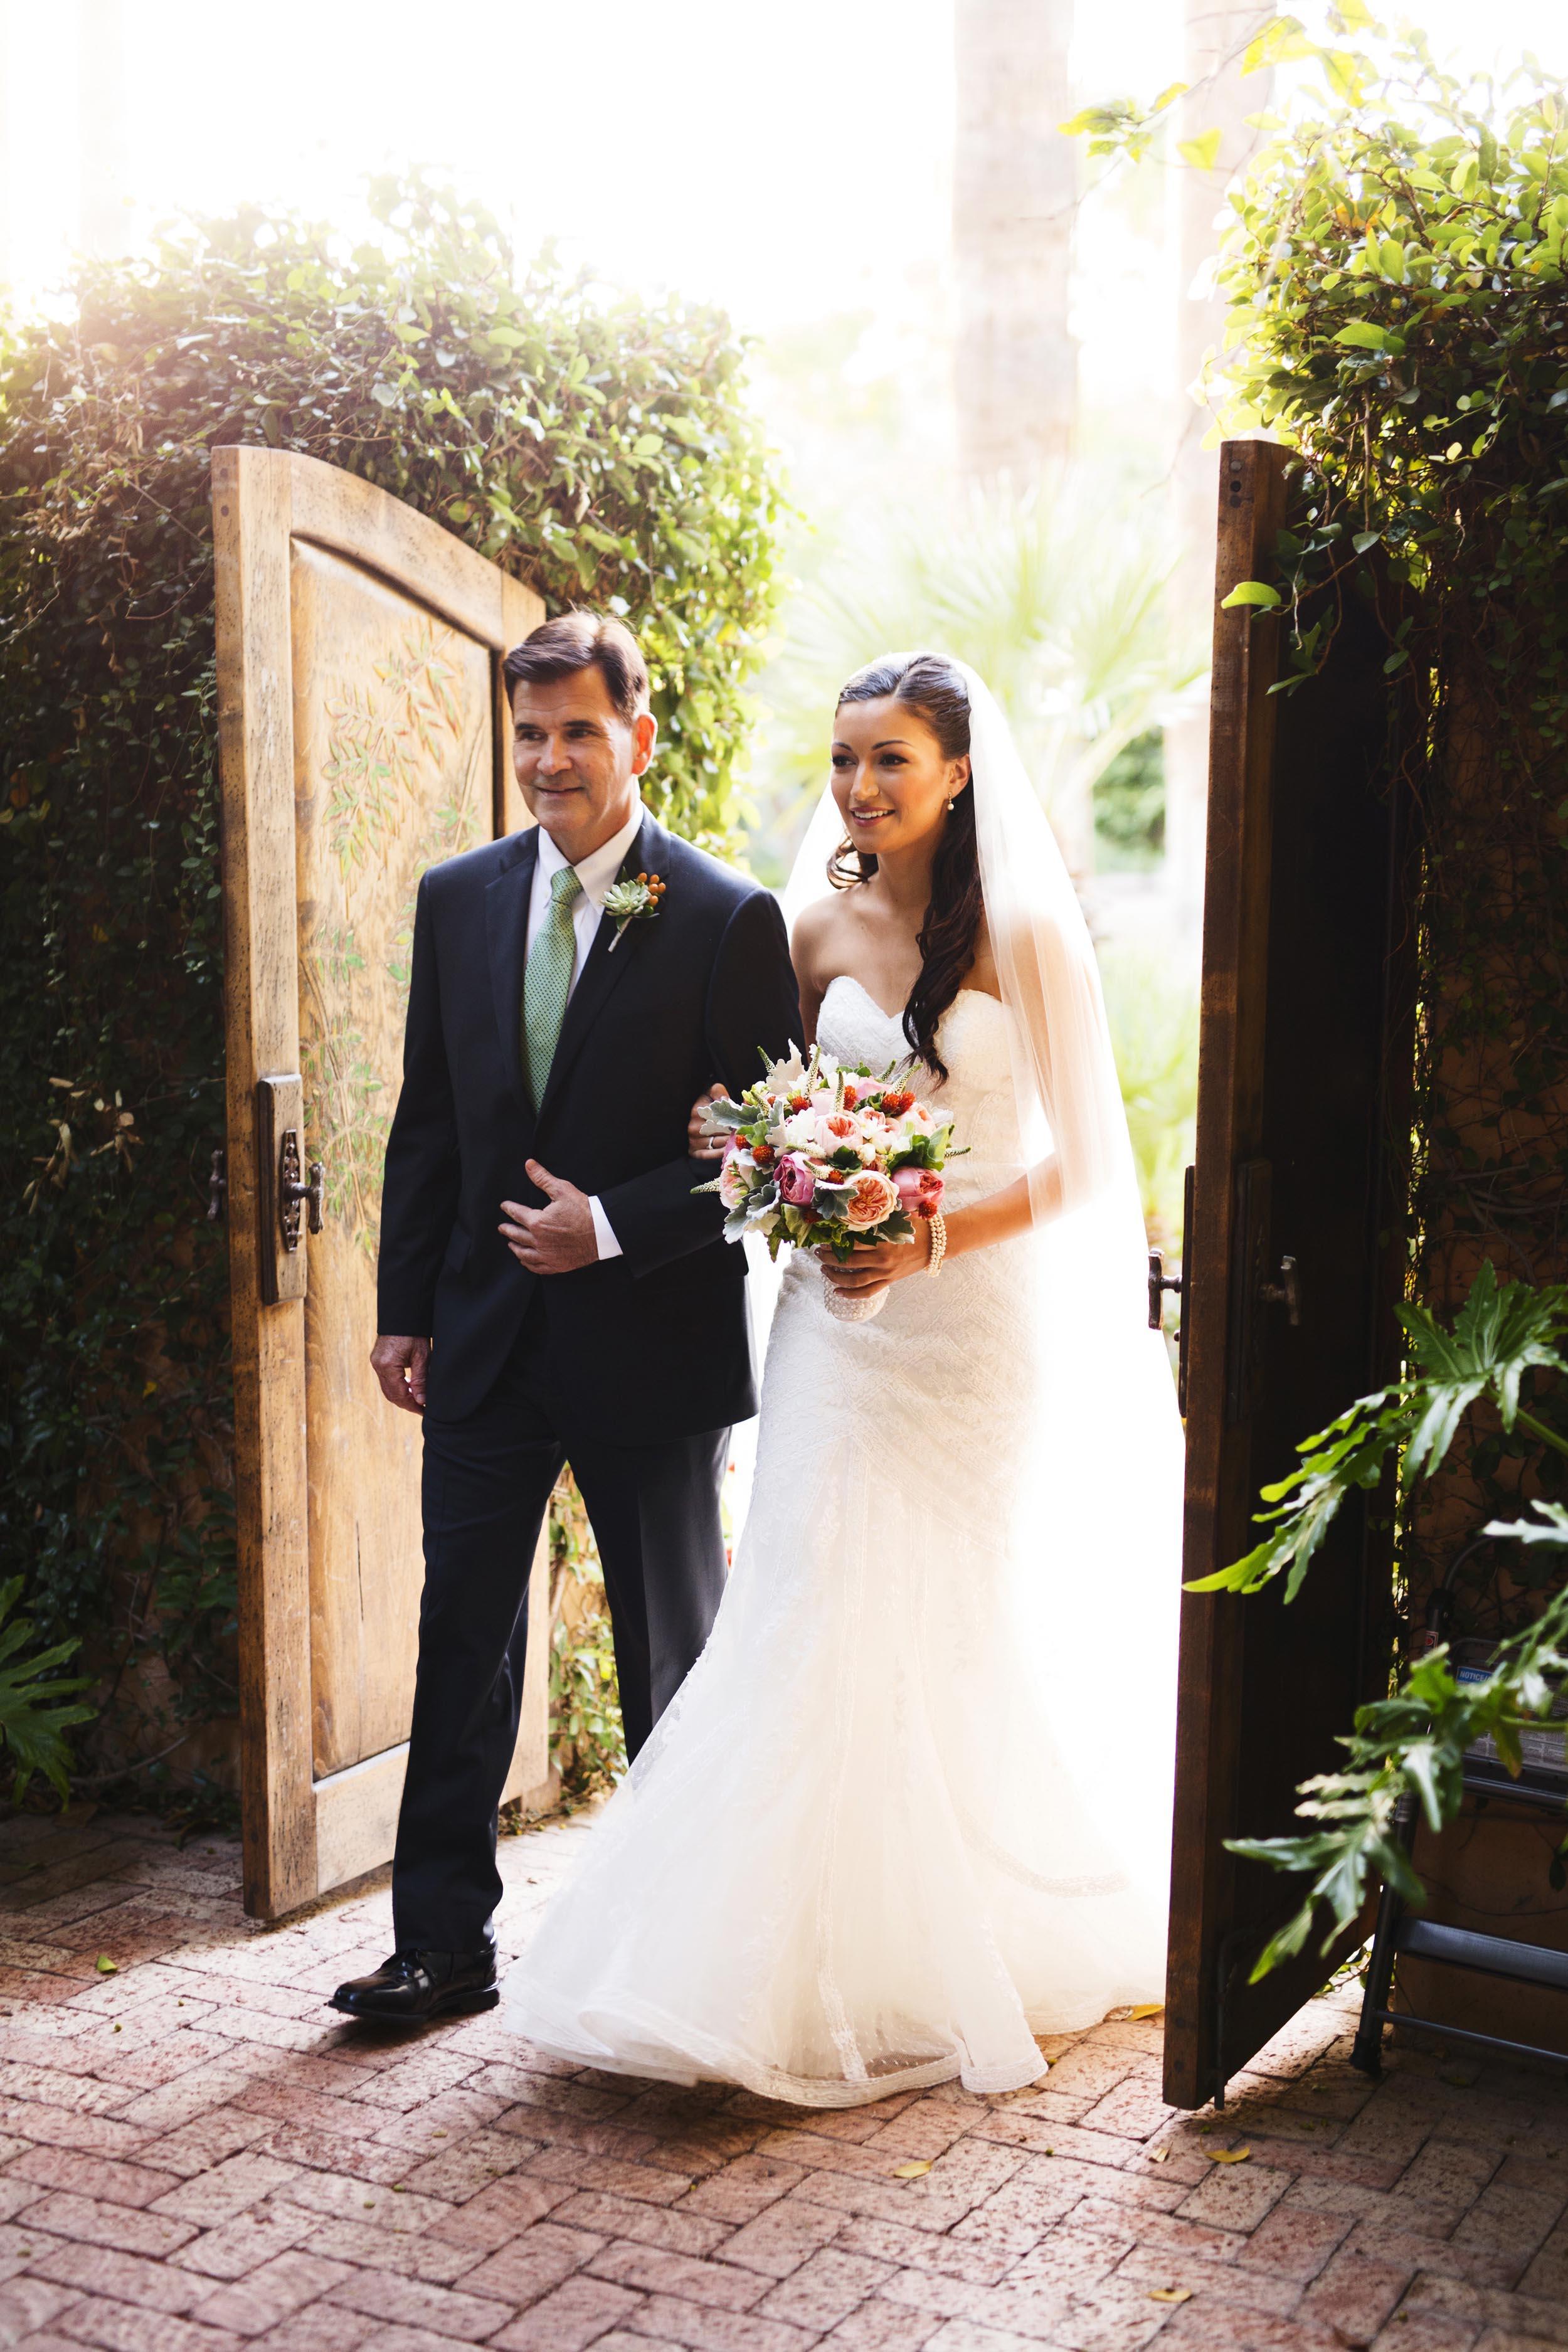 weddings-royalpalms-11.JPG